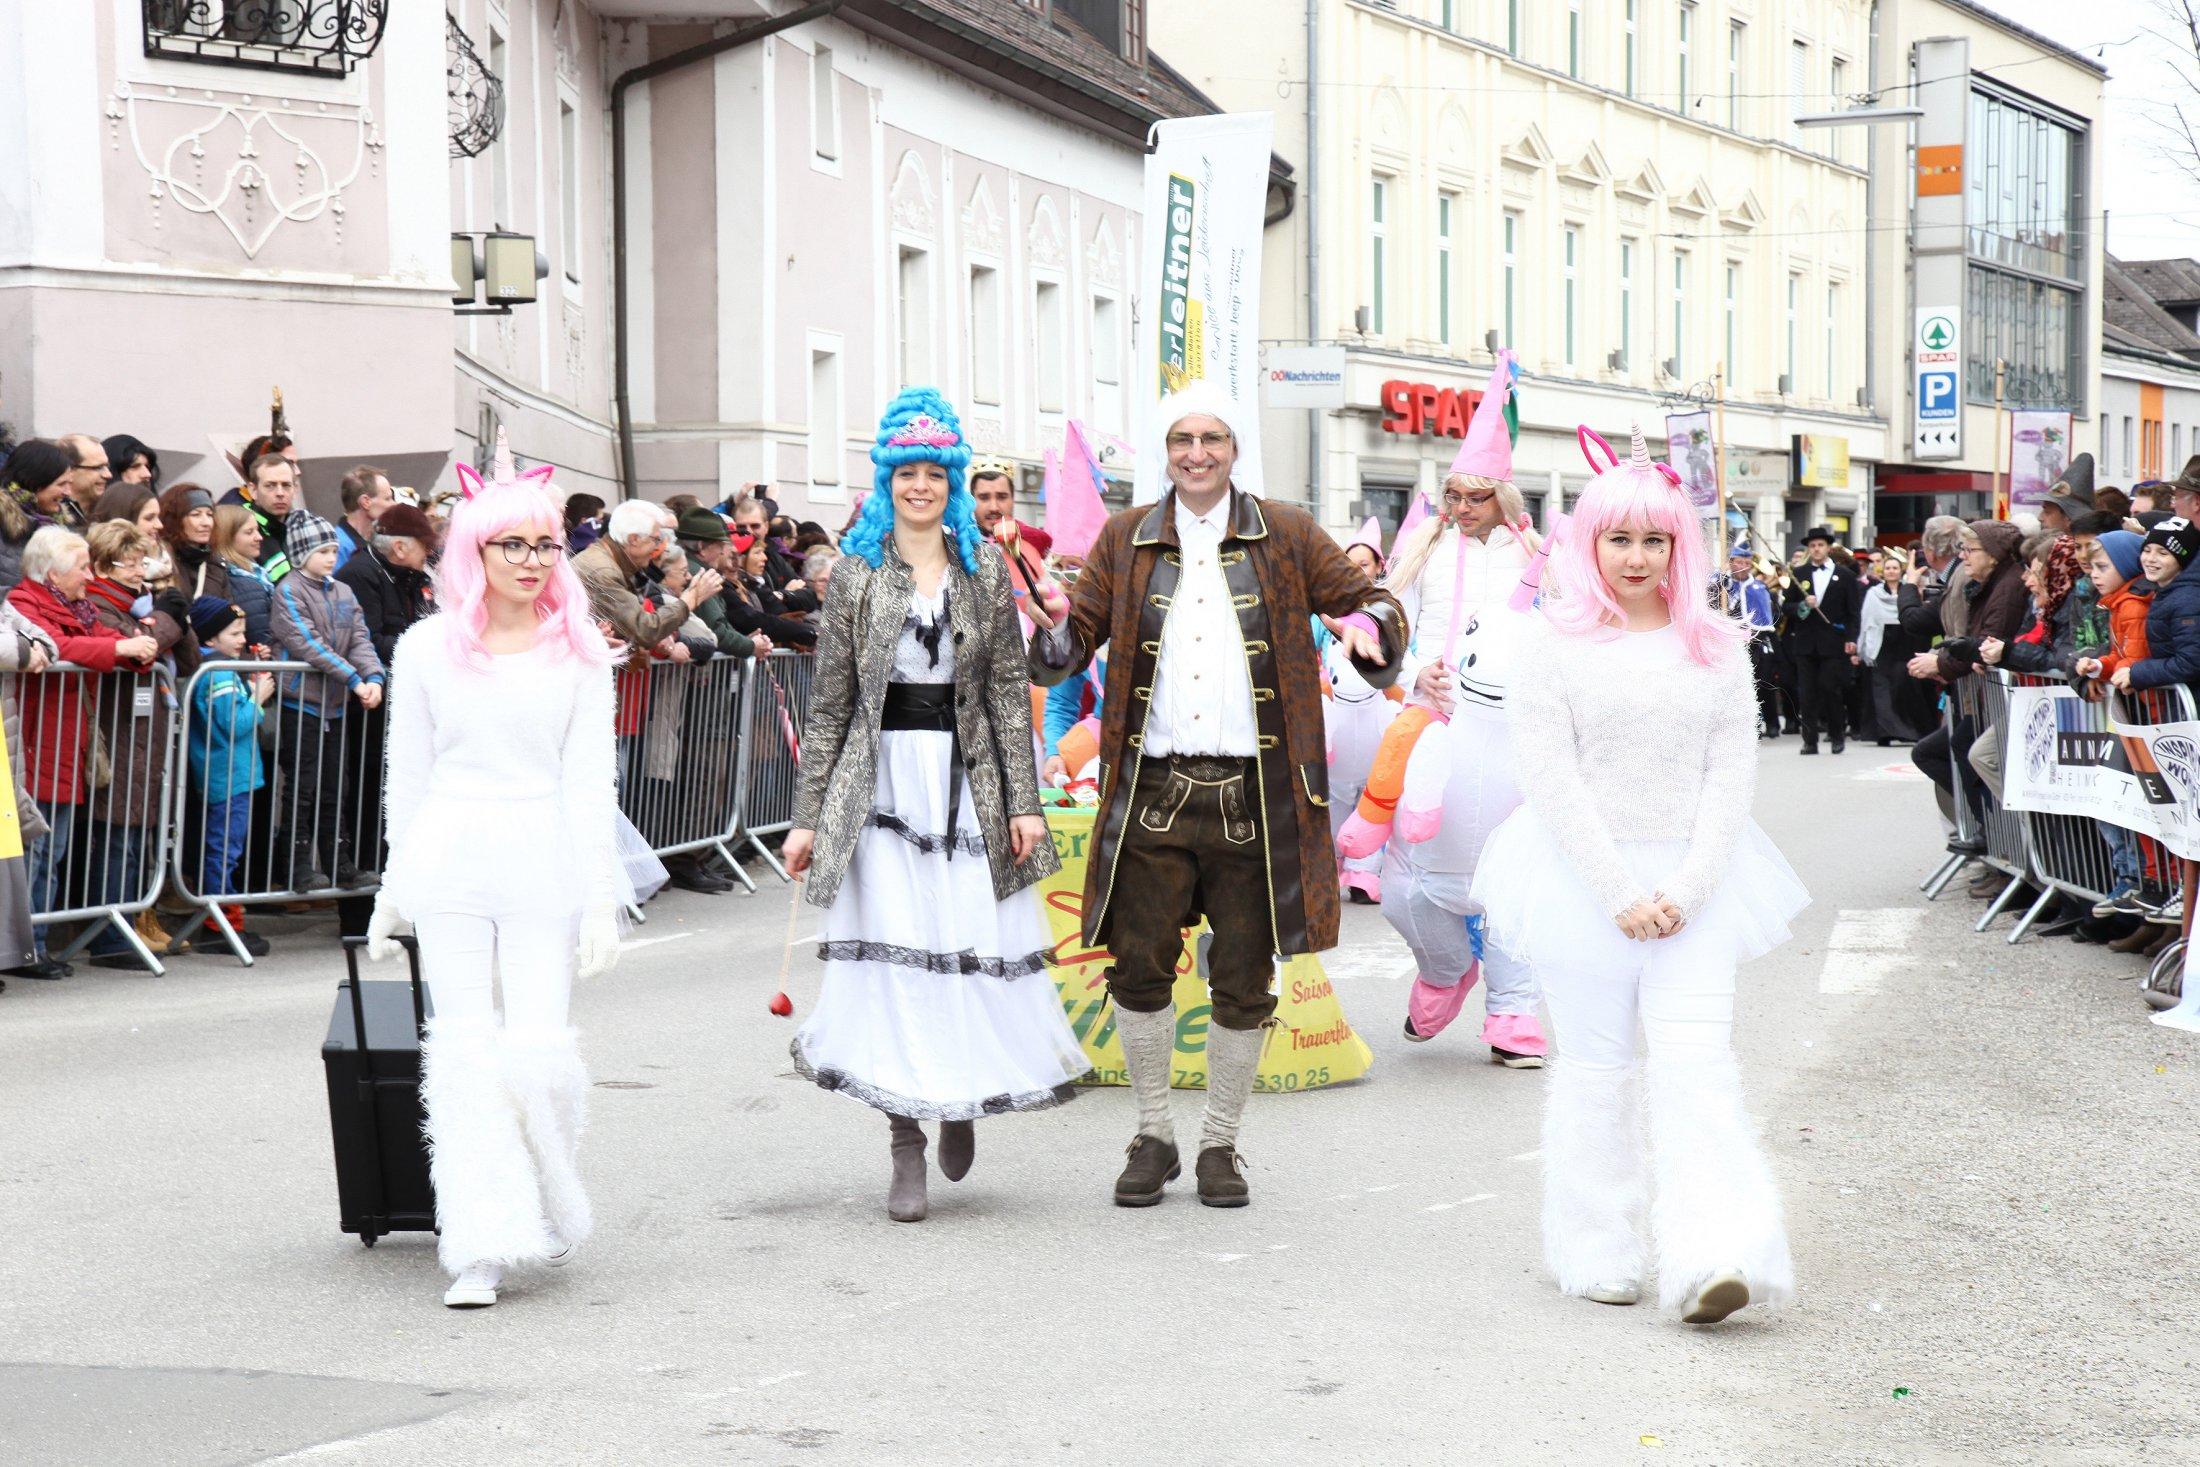 Faschingsumzug-Perg-2017153